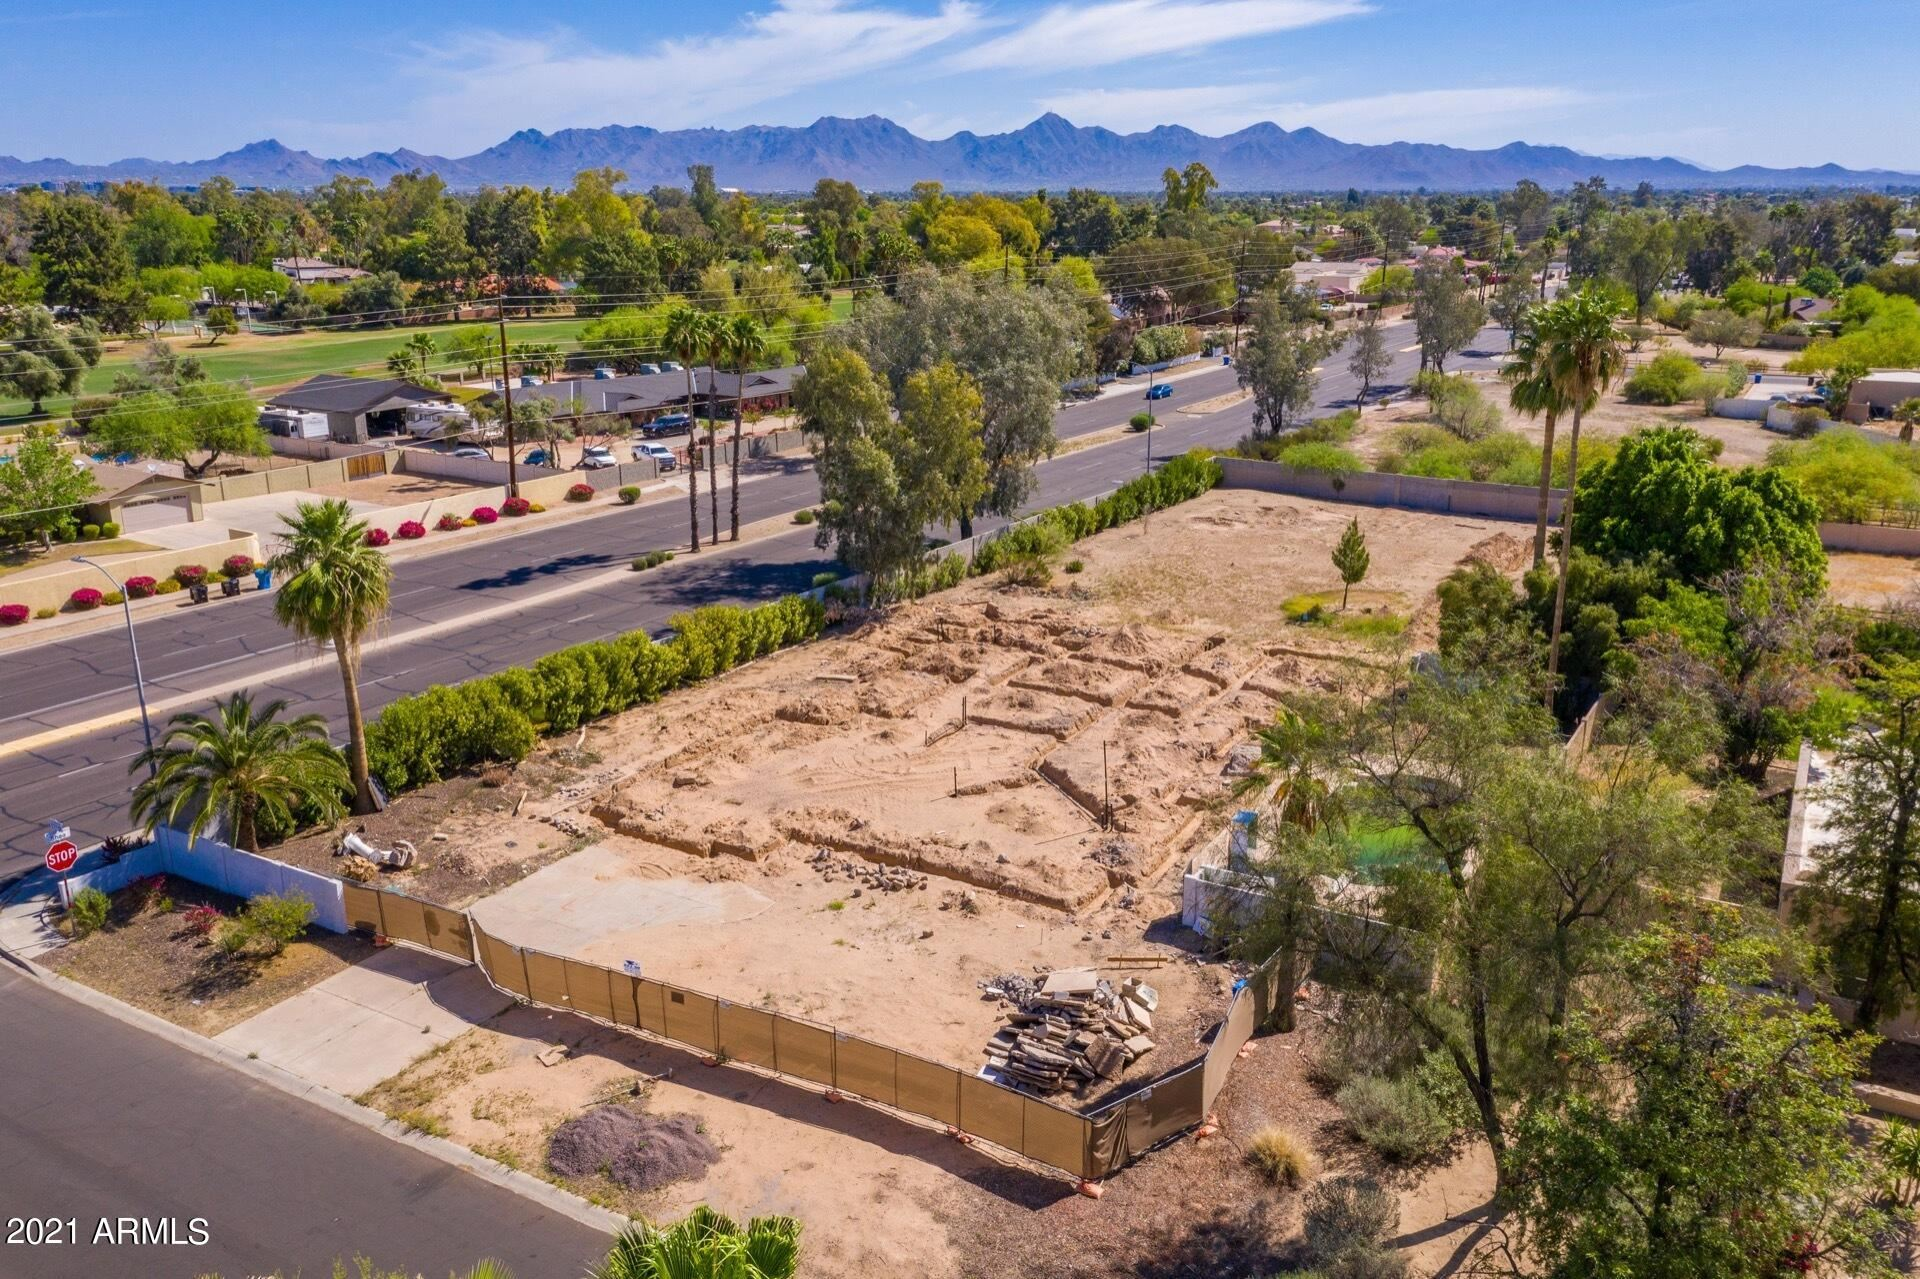 Photo of 10441 N 57TH Street, Paradise Valley, AZ 85253 (MLS # 6264793)